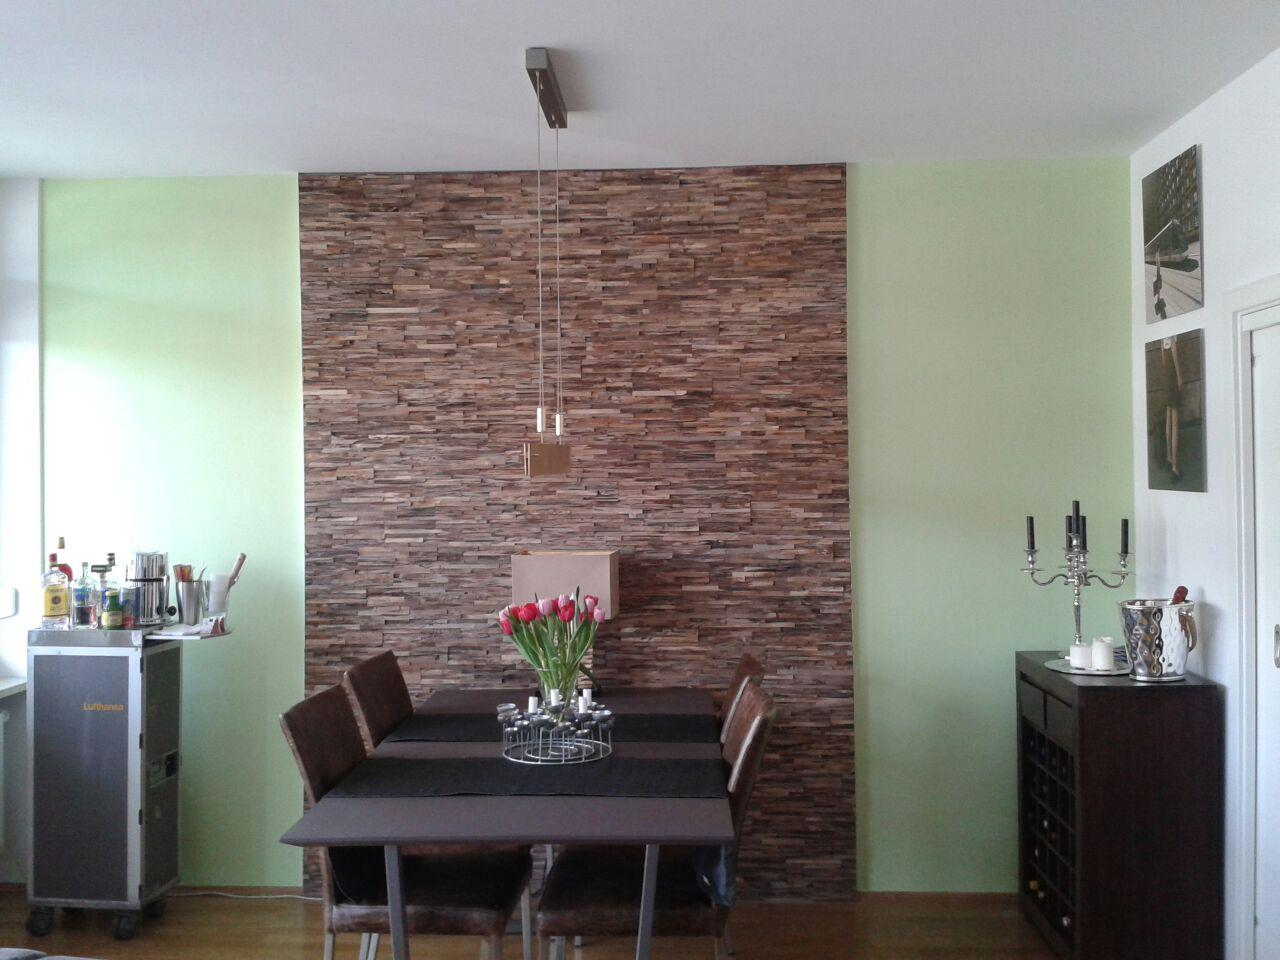 holz wandverkleidung teak grau braun bs holzdesign. Black Bedroom Furniture Sets. Home Design Ideas